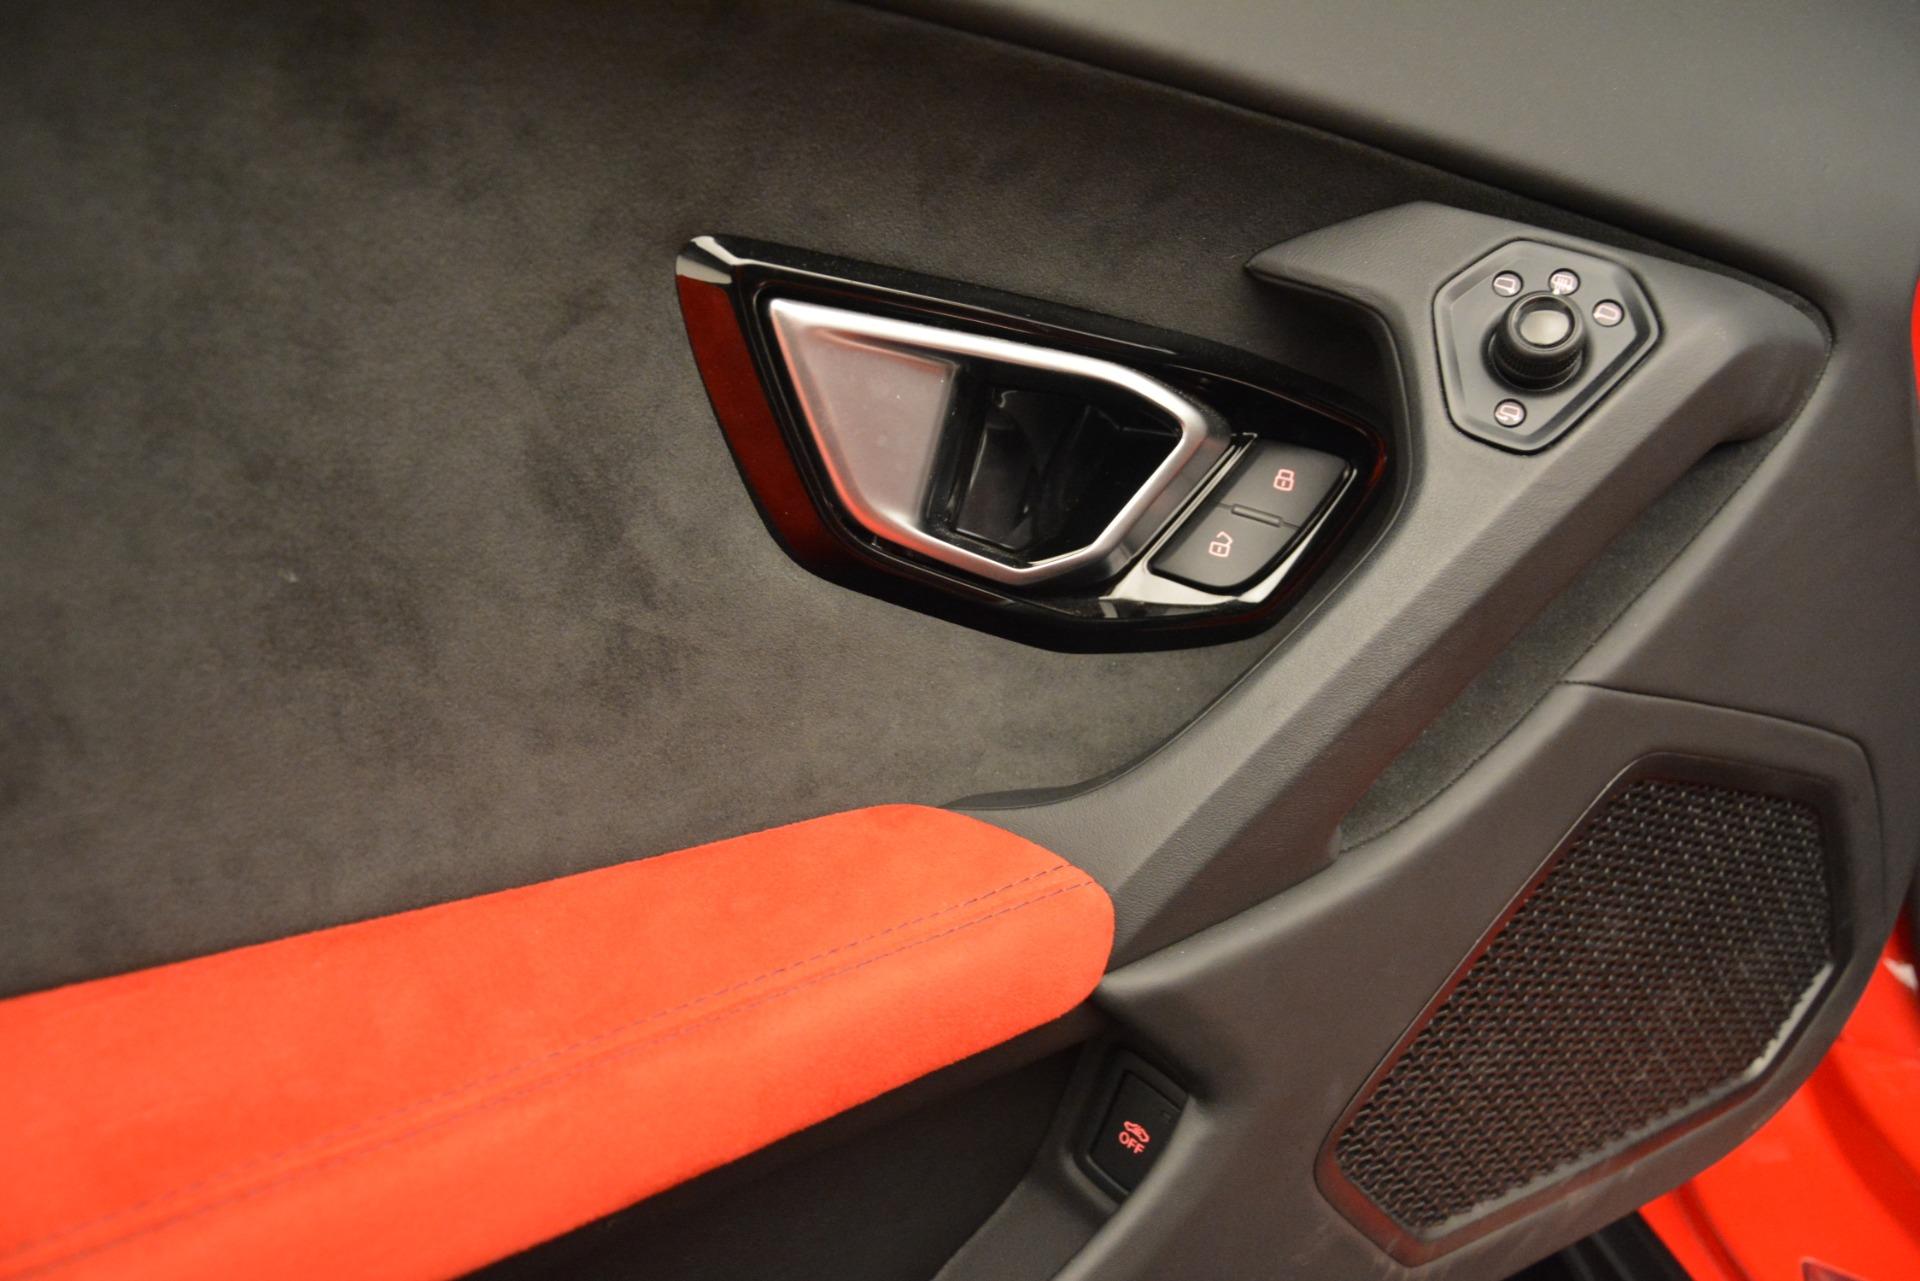 Used 2017 Lamborghini Huracan LP 610-4 Spyder For Sale 227900 In Greenwich, CT